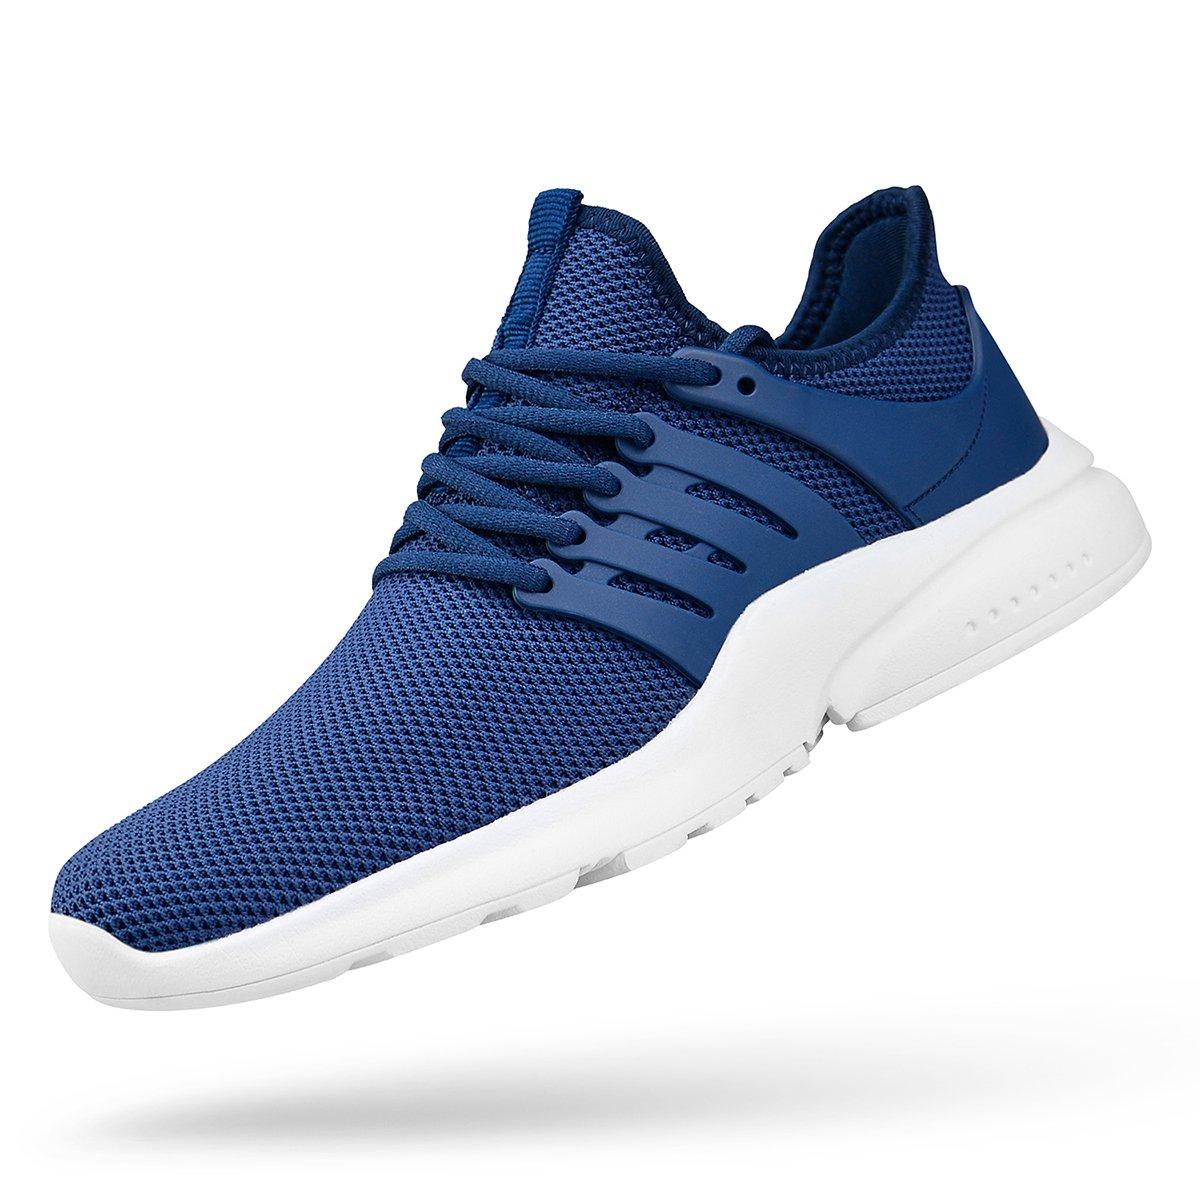 bluee White Mxson Women's Ultra Lightweight Breathable Mesh Street Sport Walking shoes Casual Sneakers